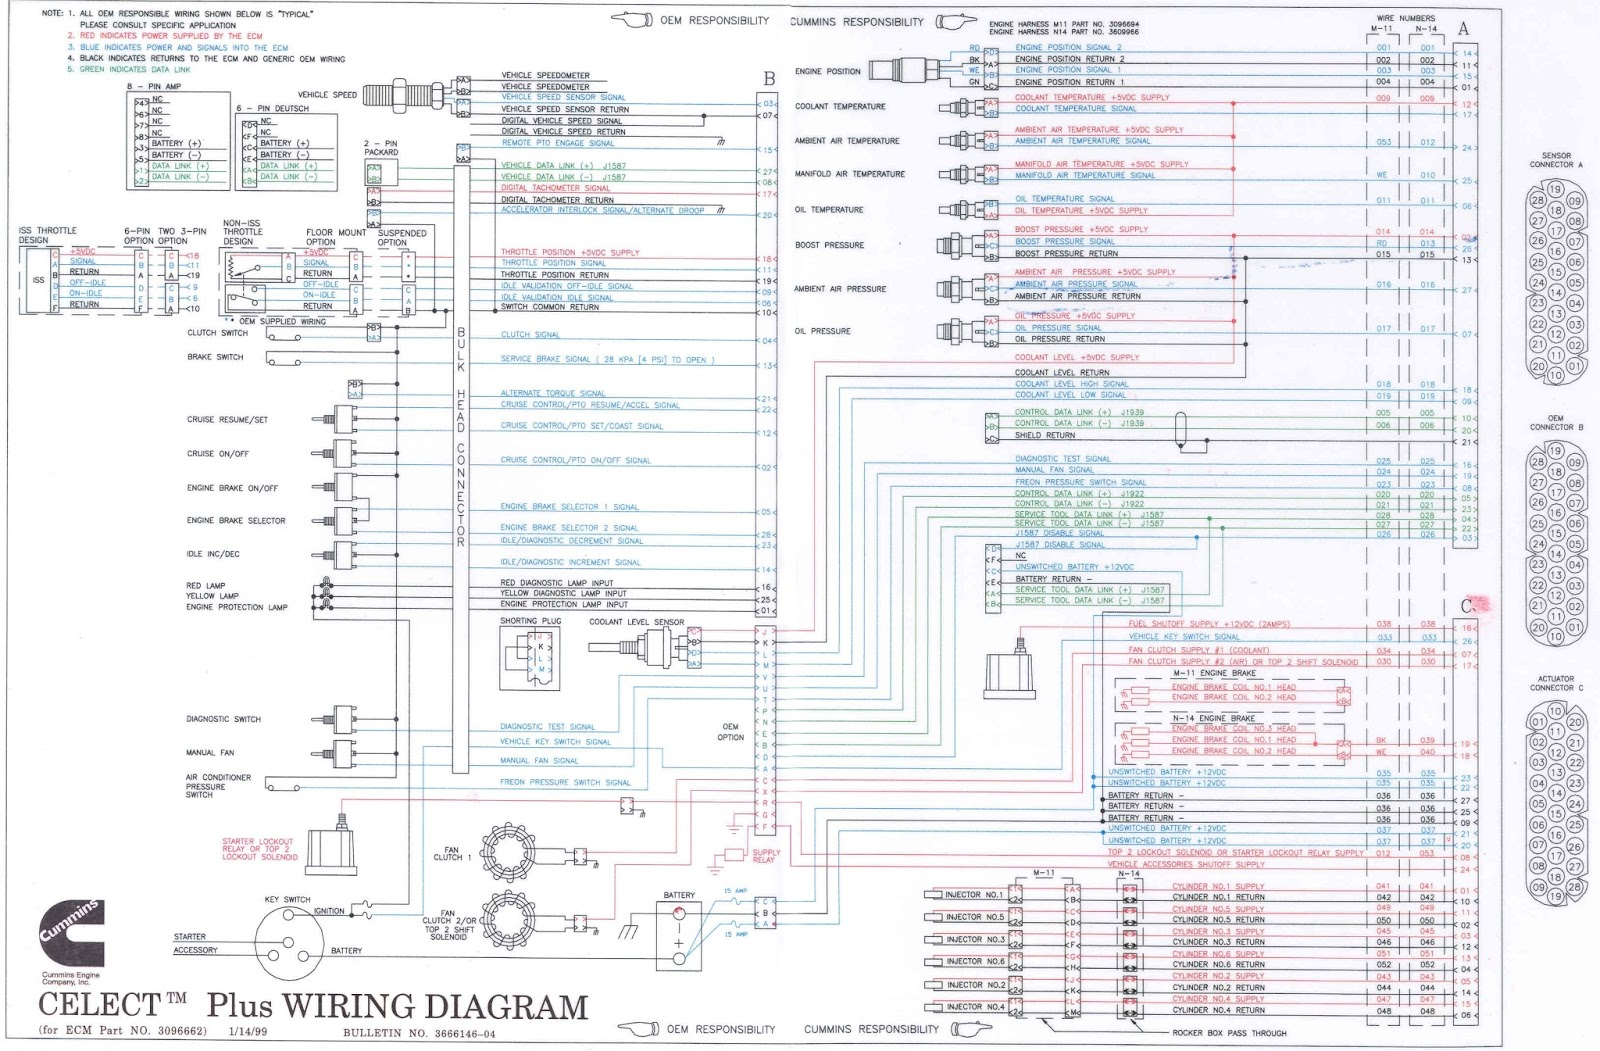 medium resolution of celect plus wiring diagram wiring diagram datasource m 11 ecm wiring diagram manual e book m11